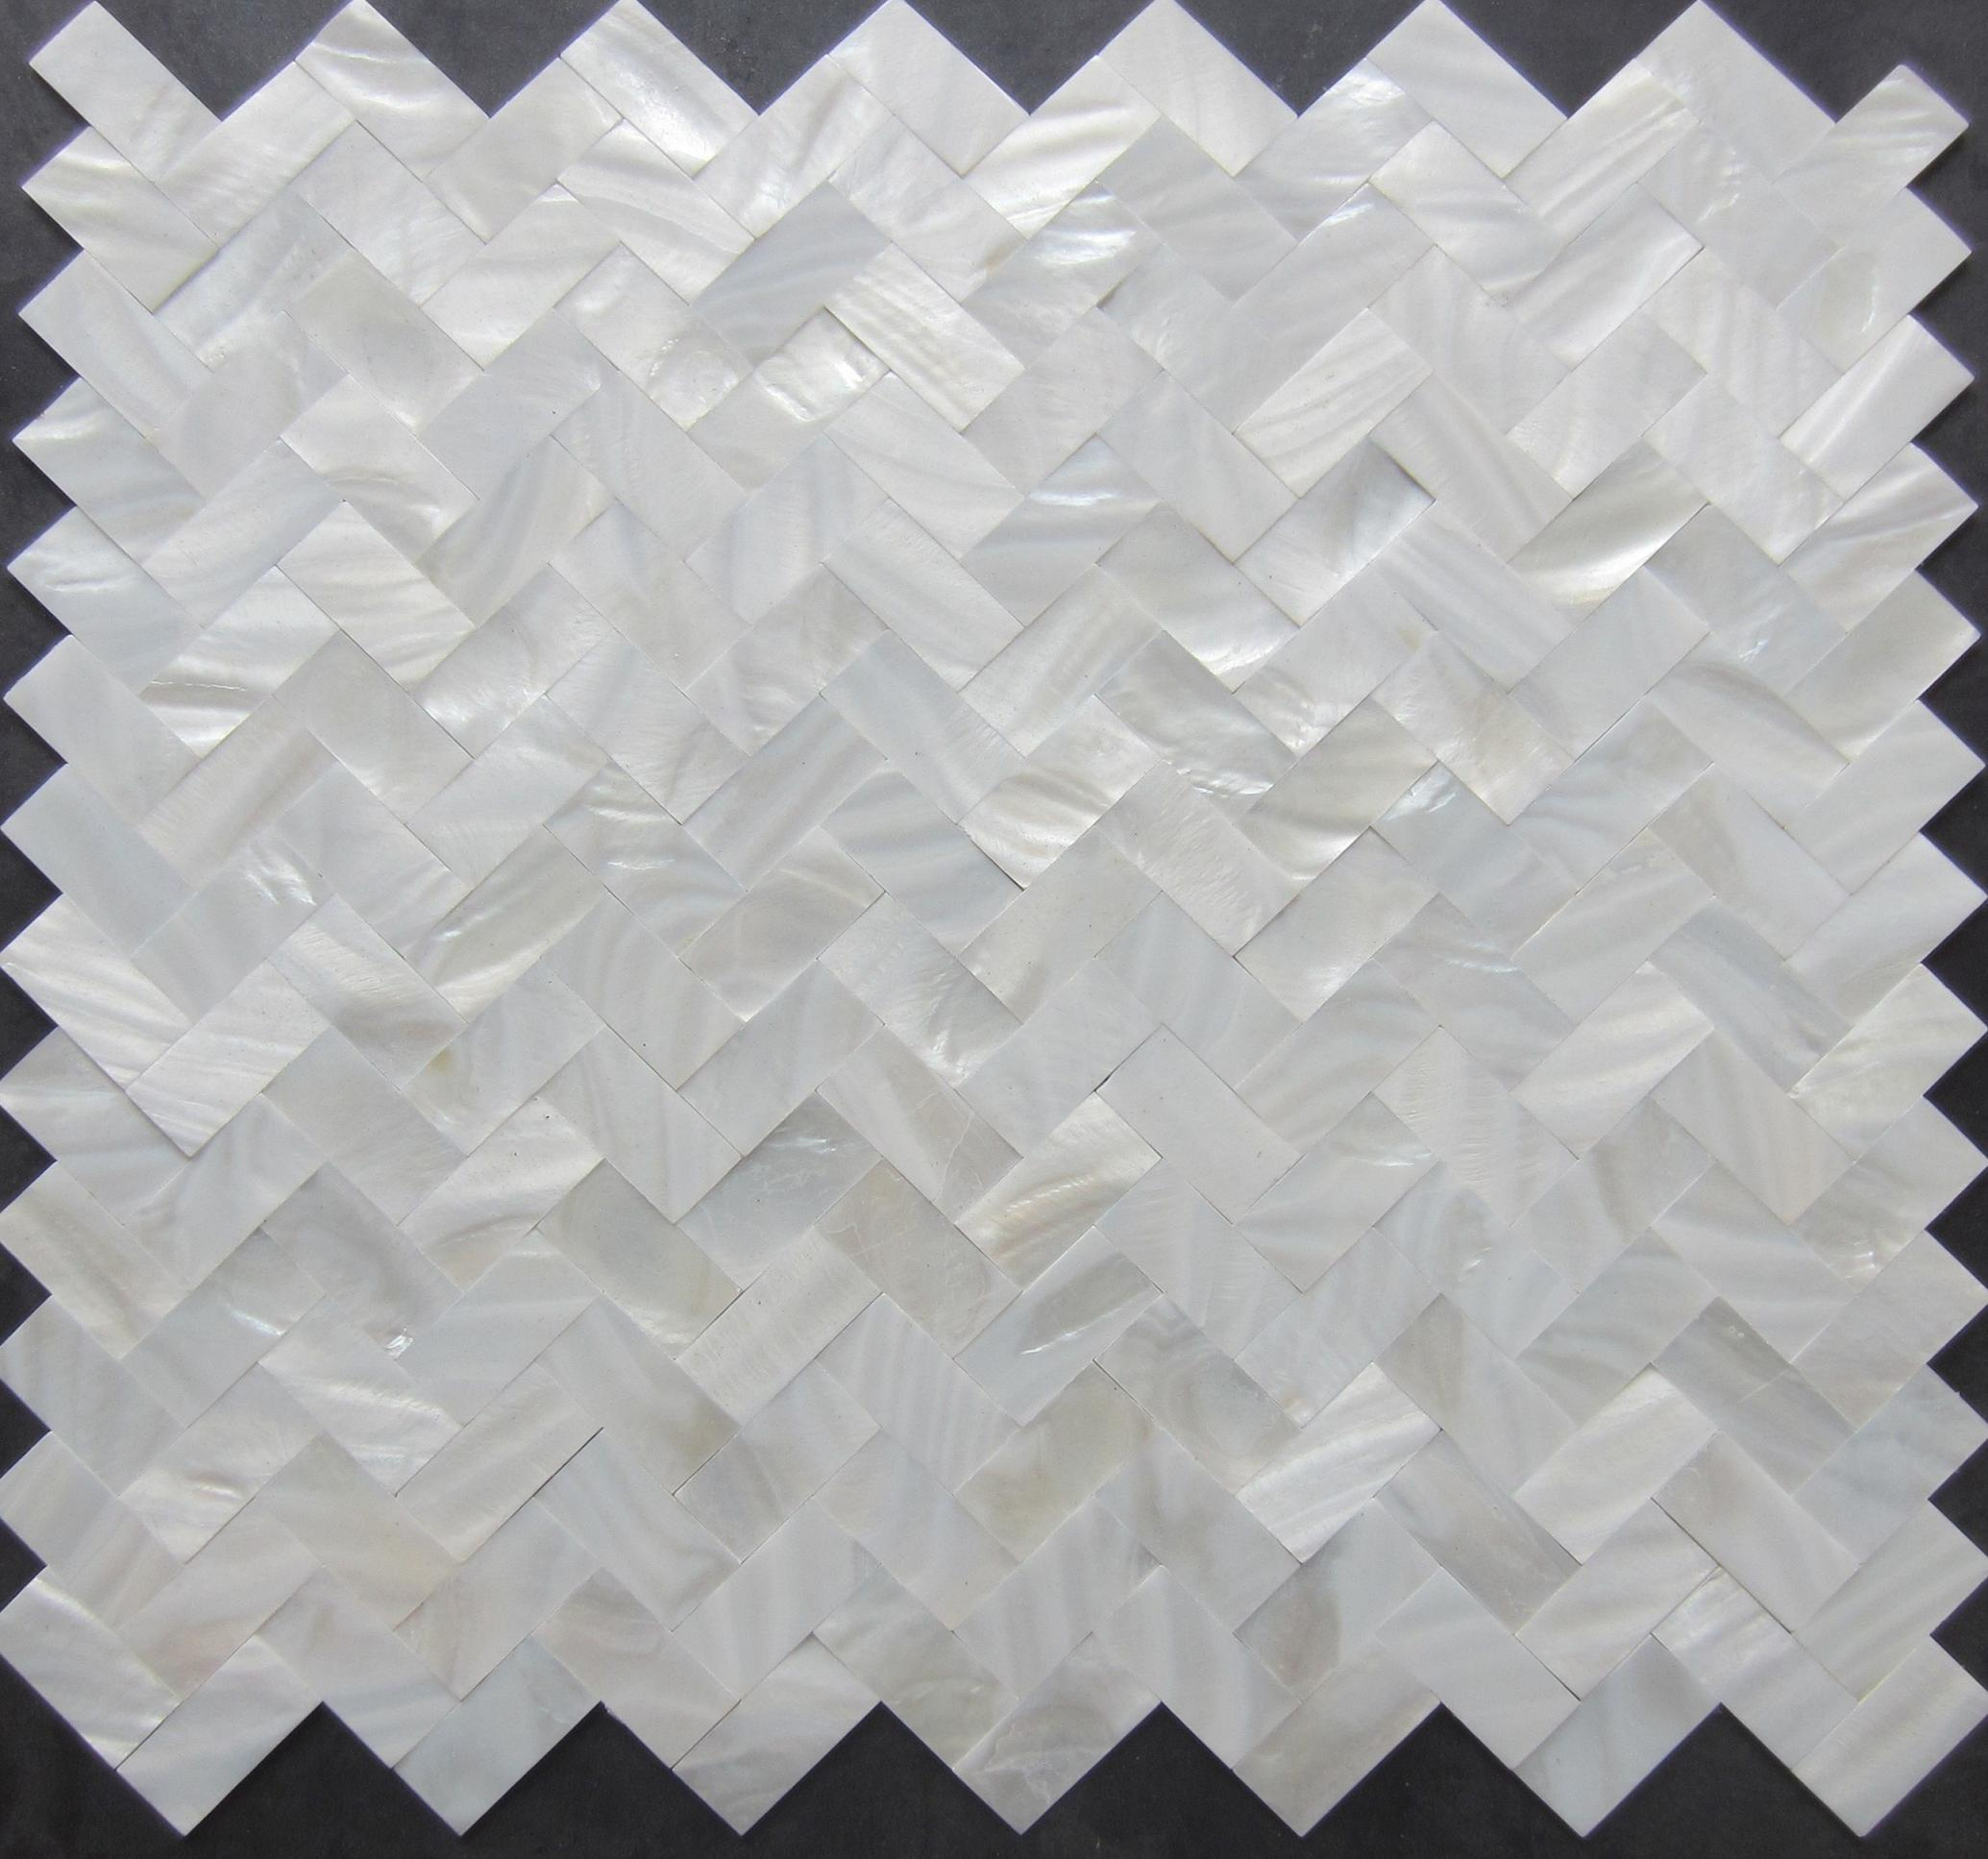 Online Cheap 2017 New Style!!! Herringbone Mosaics Tiles; White ...